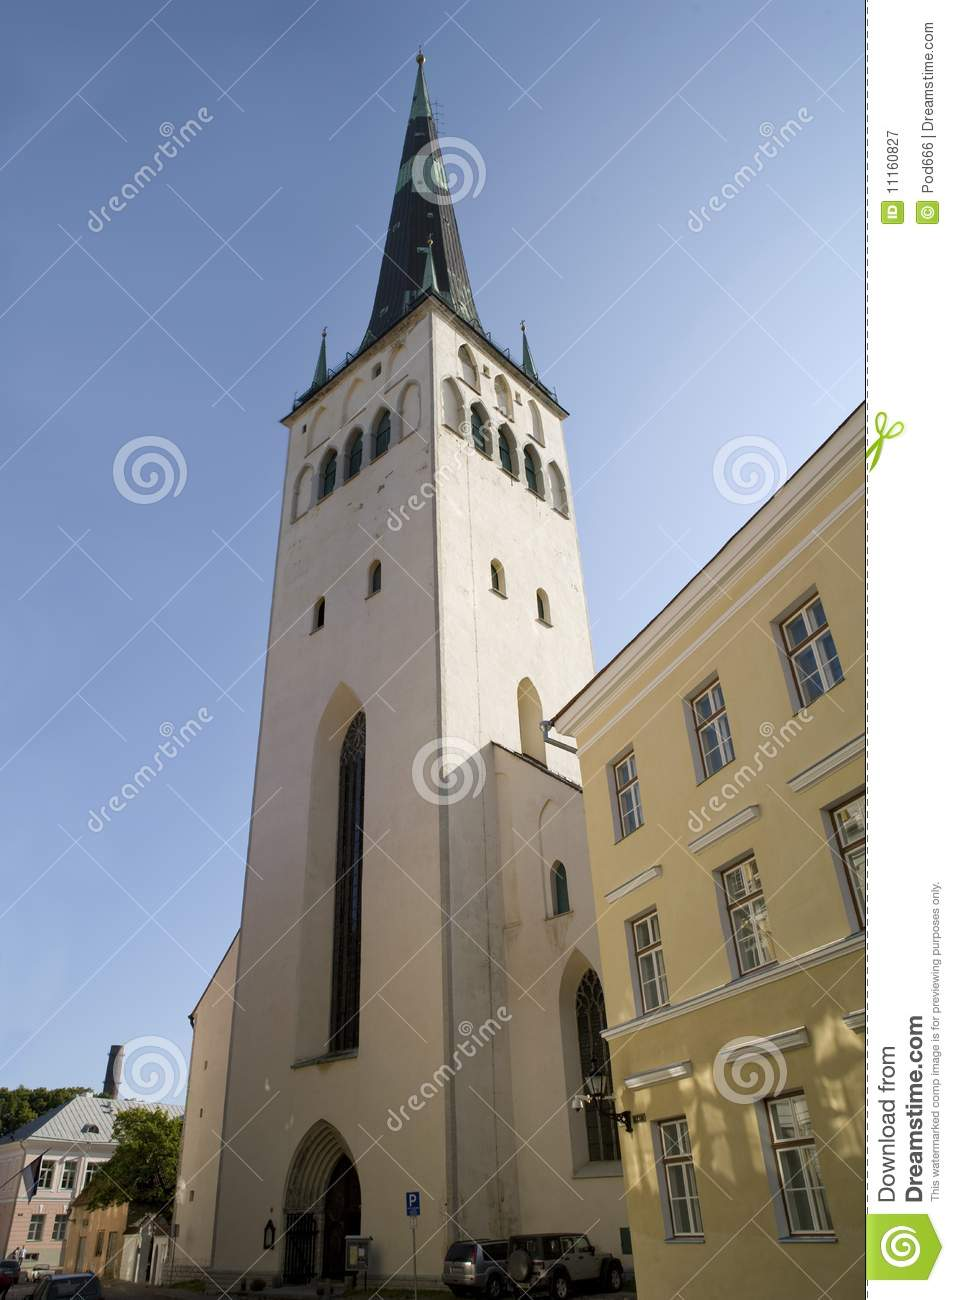 Tallinn Estonia St Olaf's Church Royalty Free Stock Photography.